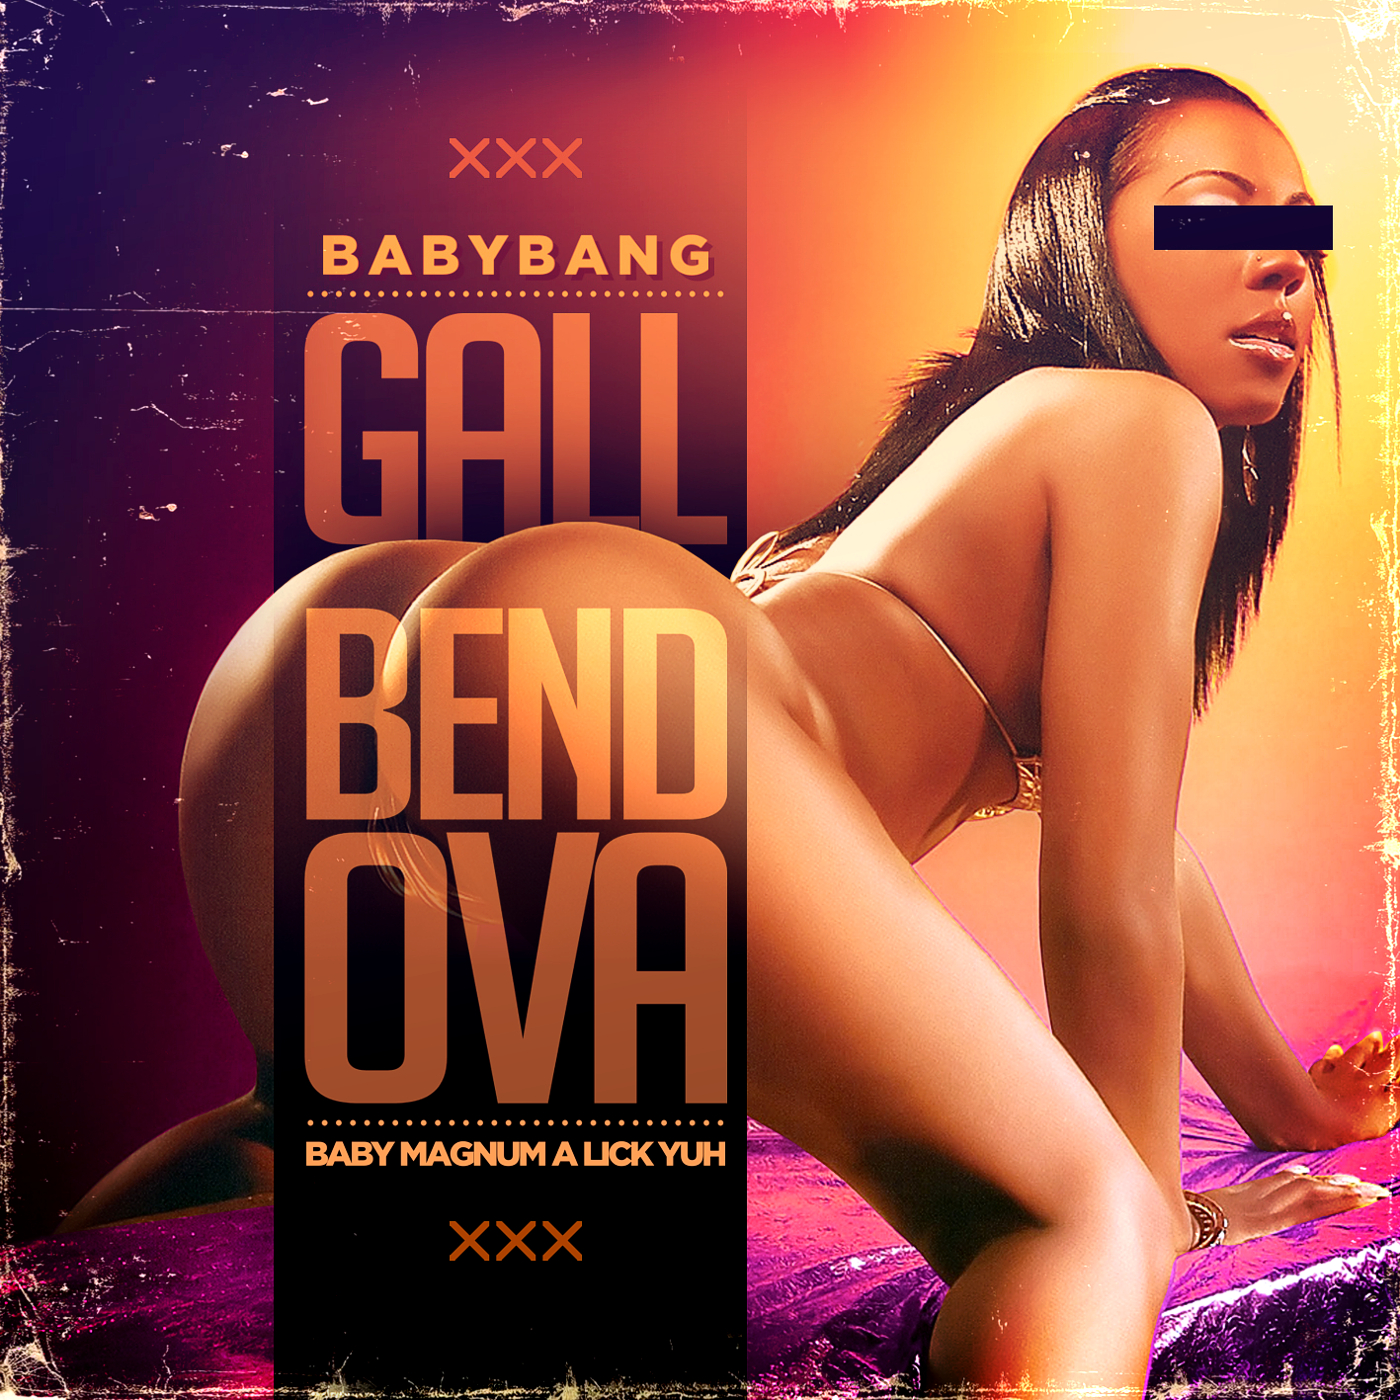 BABYBANG-GALL-BEND-OVA-MAGNUM-A-LICK-YUH-COVER